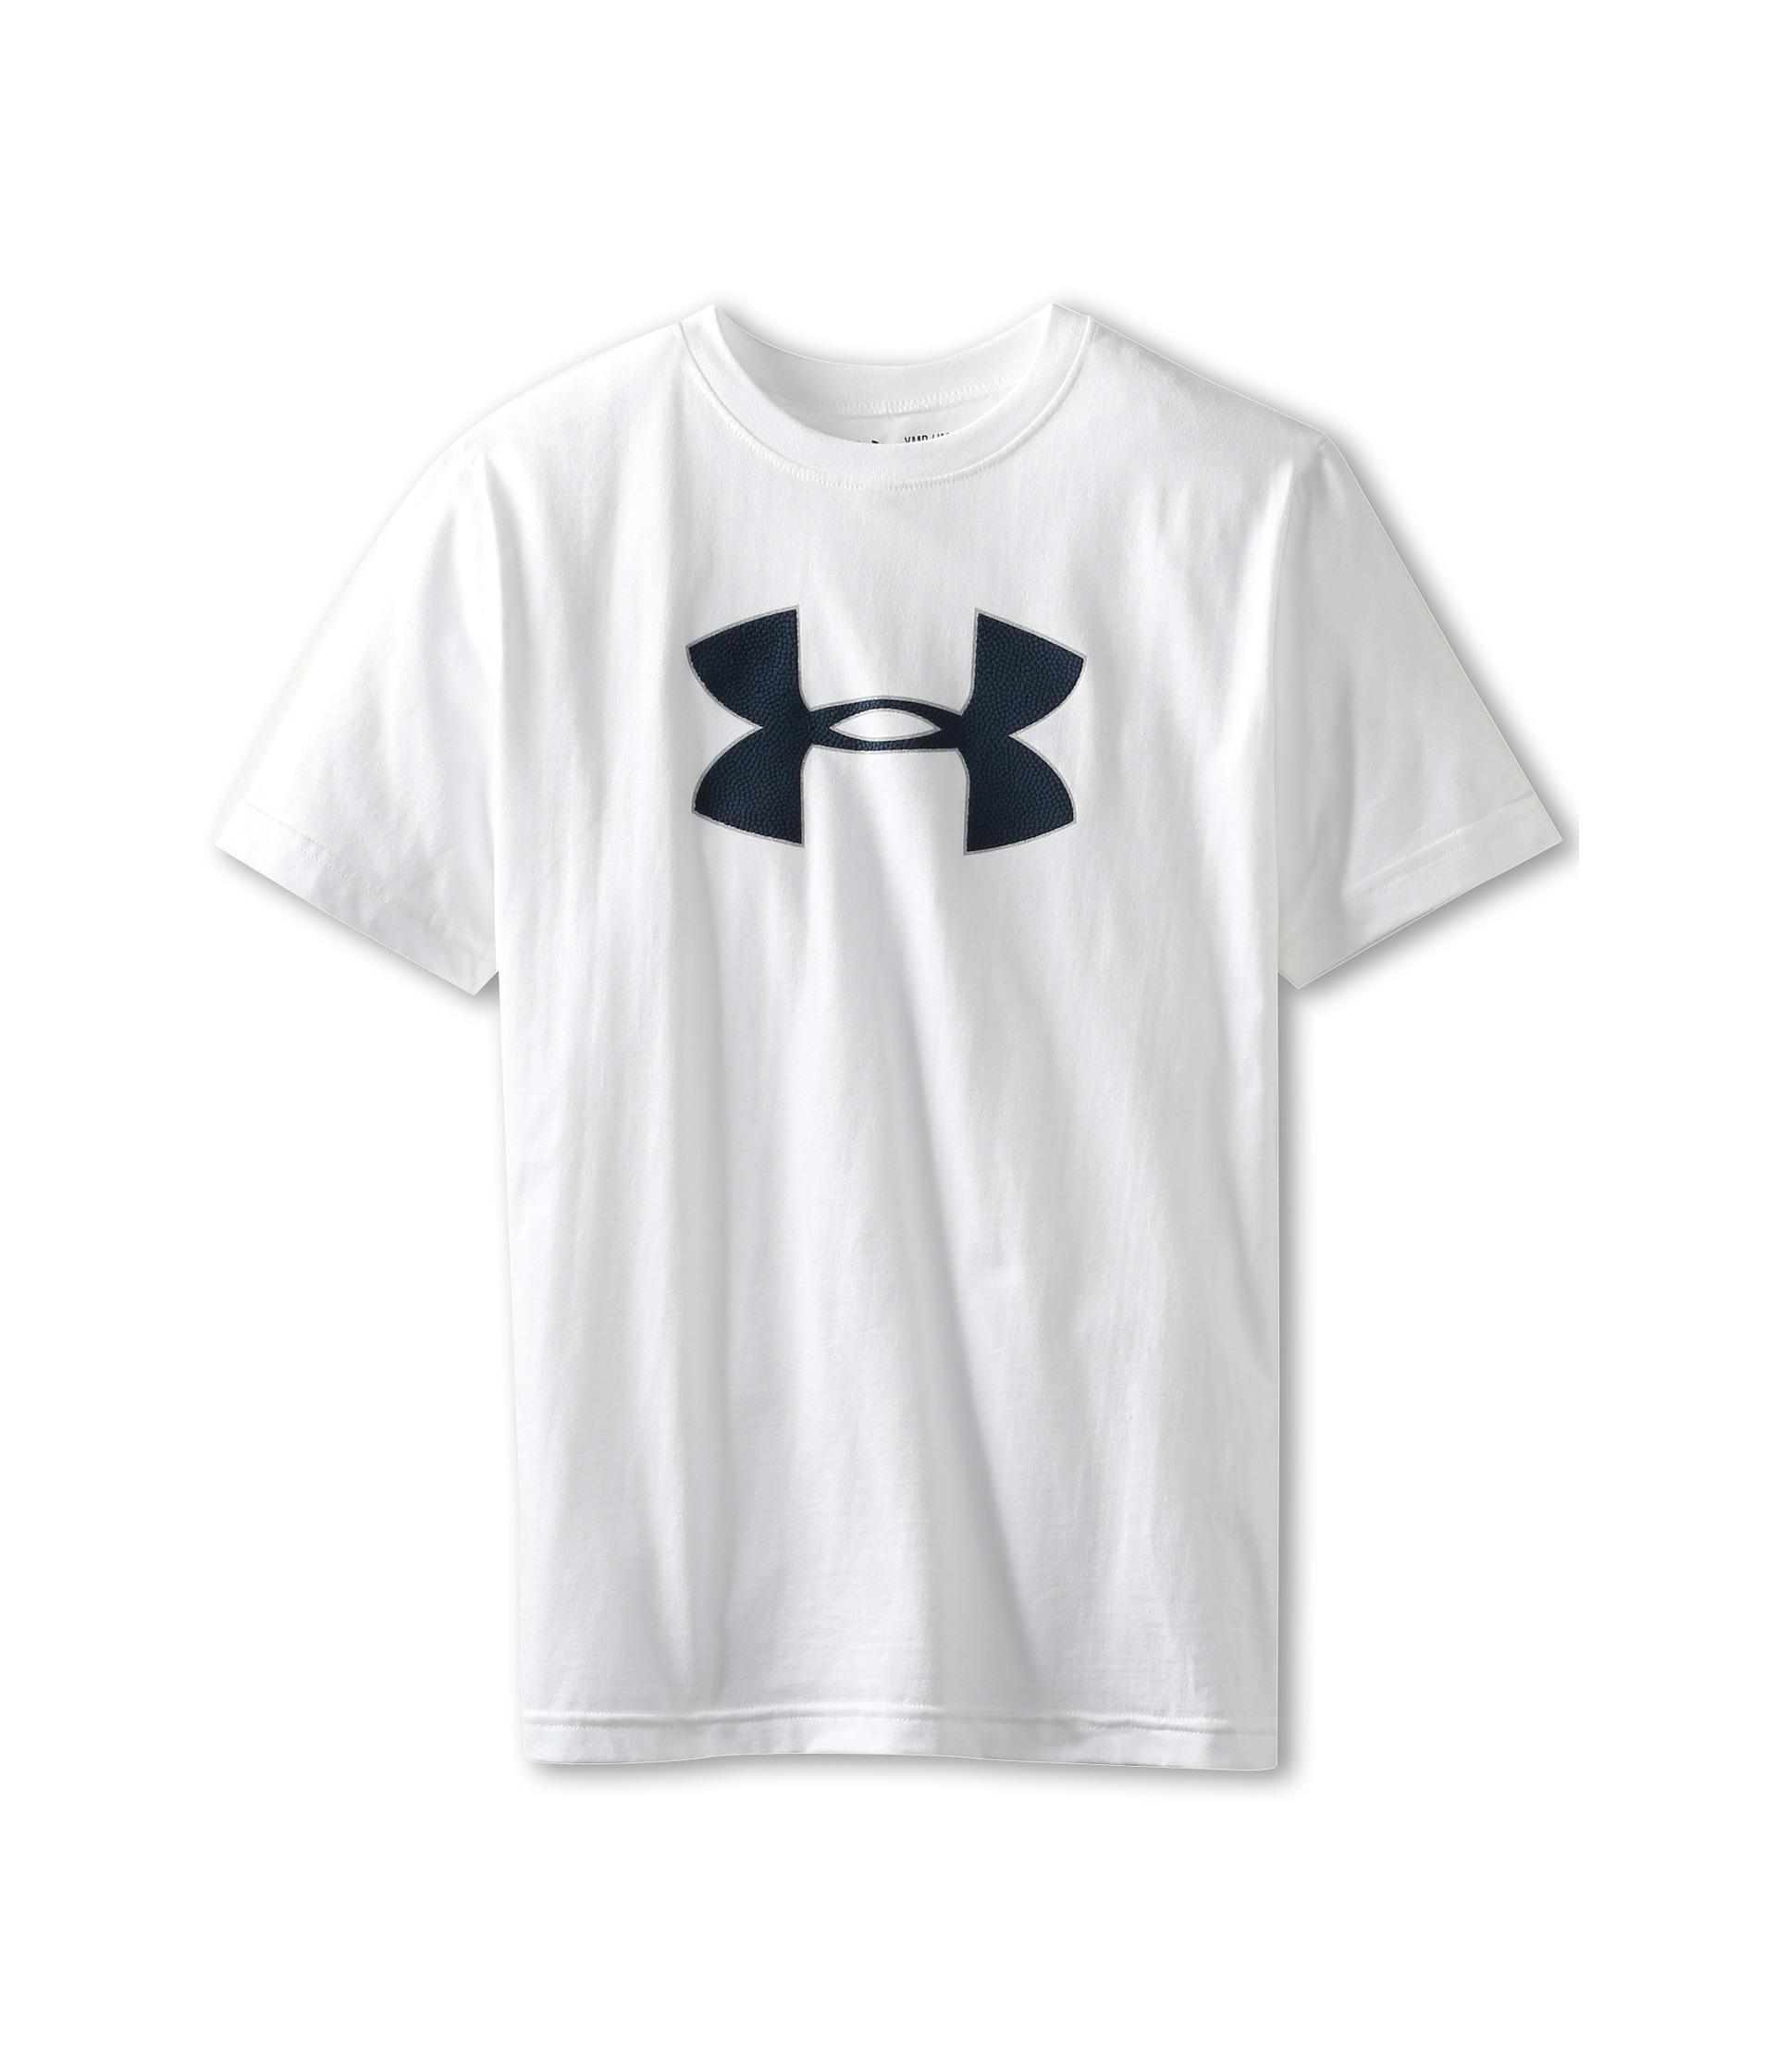 Under armour kids boys football big logo t shirt shipped for Under armour shirts for kids